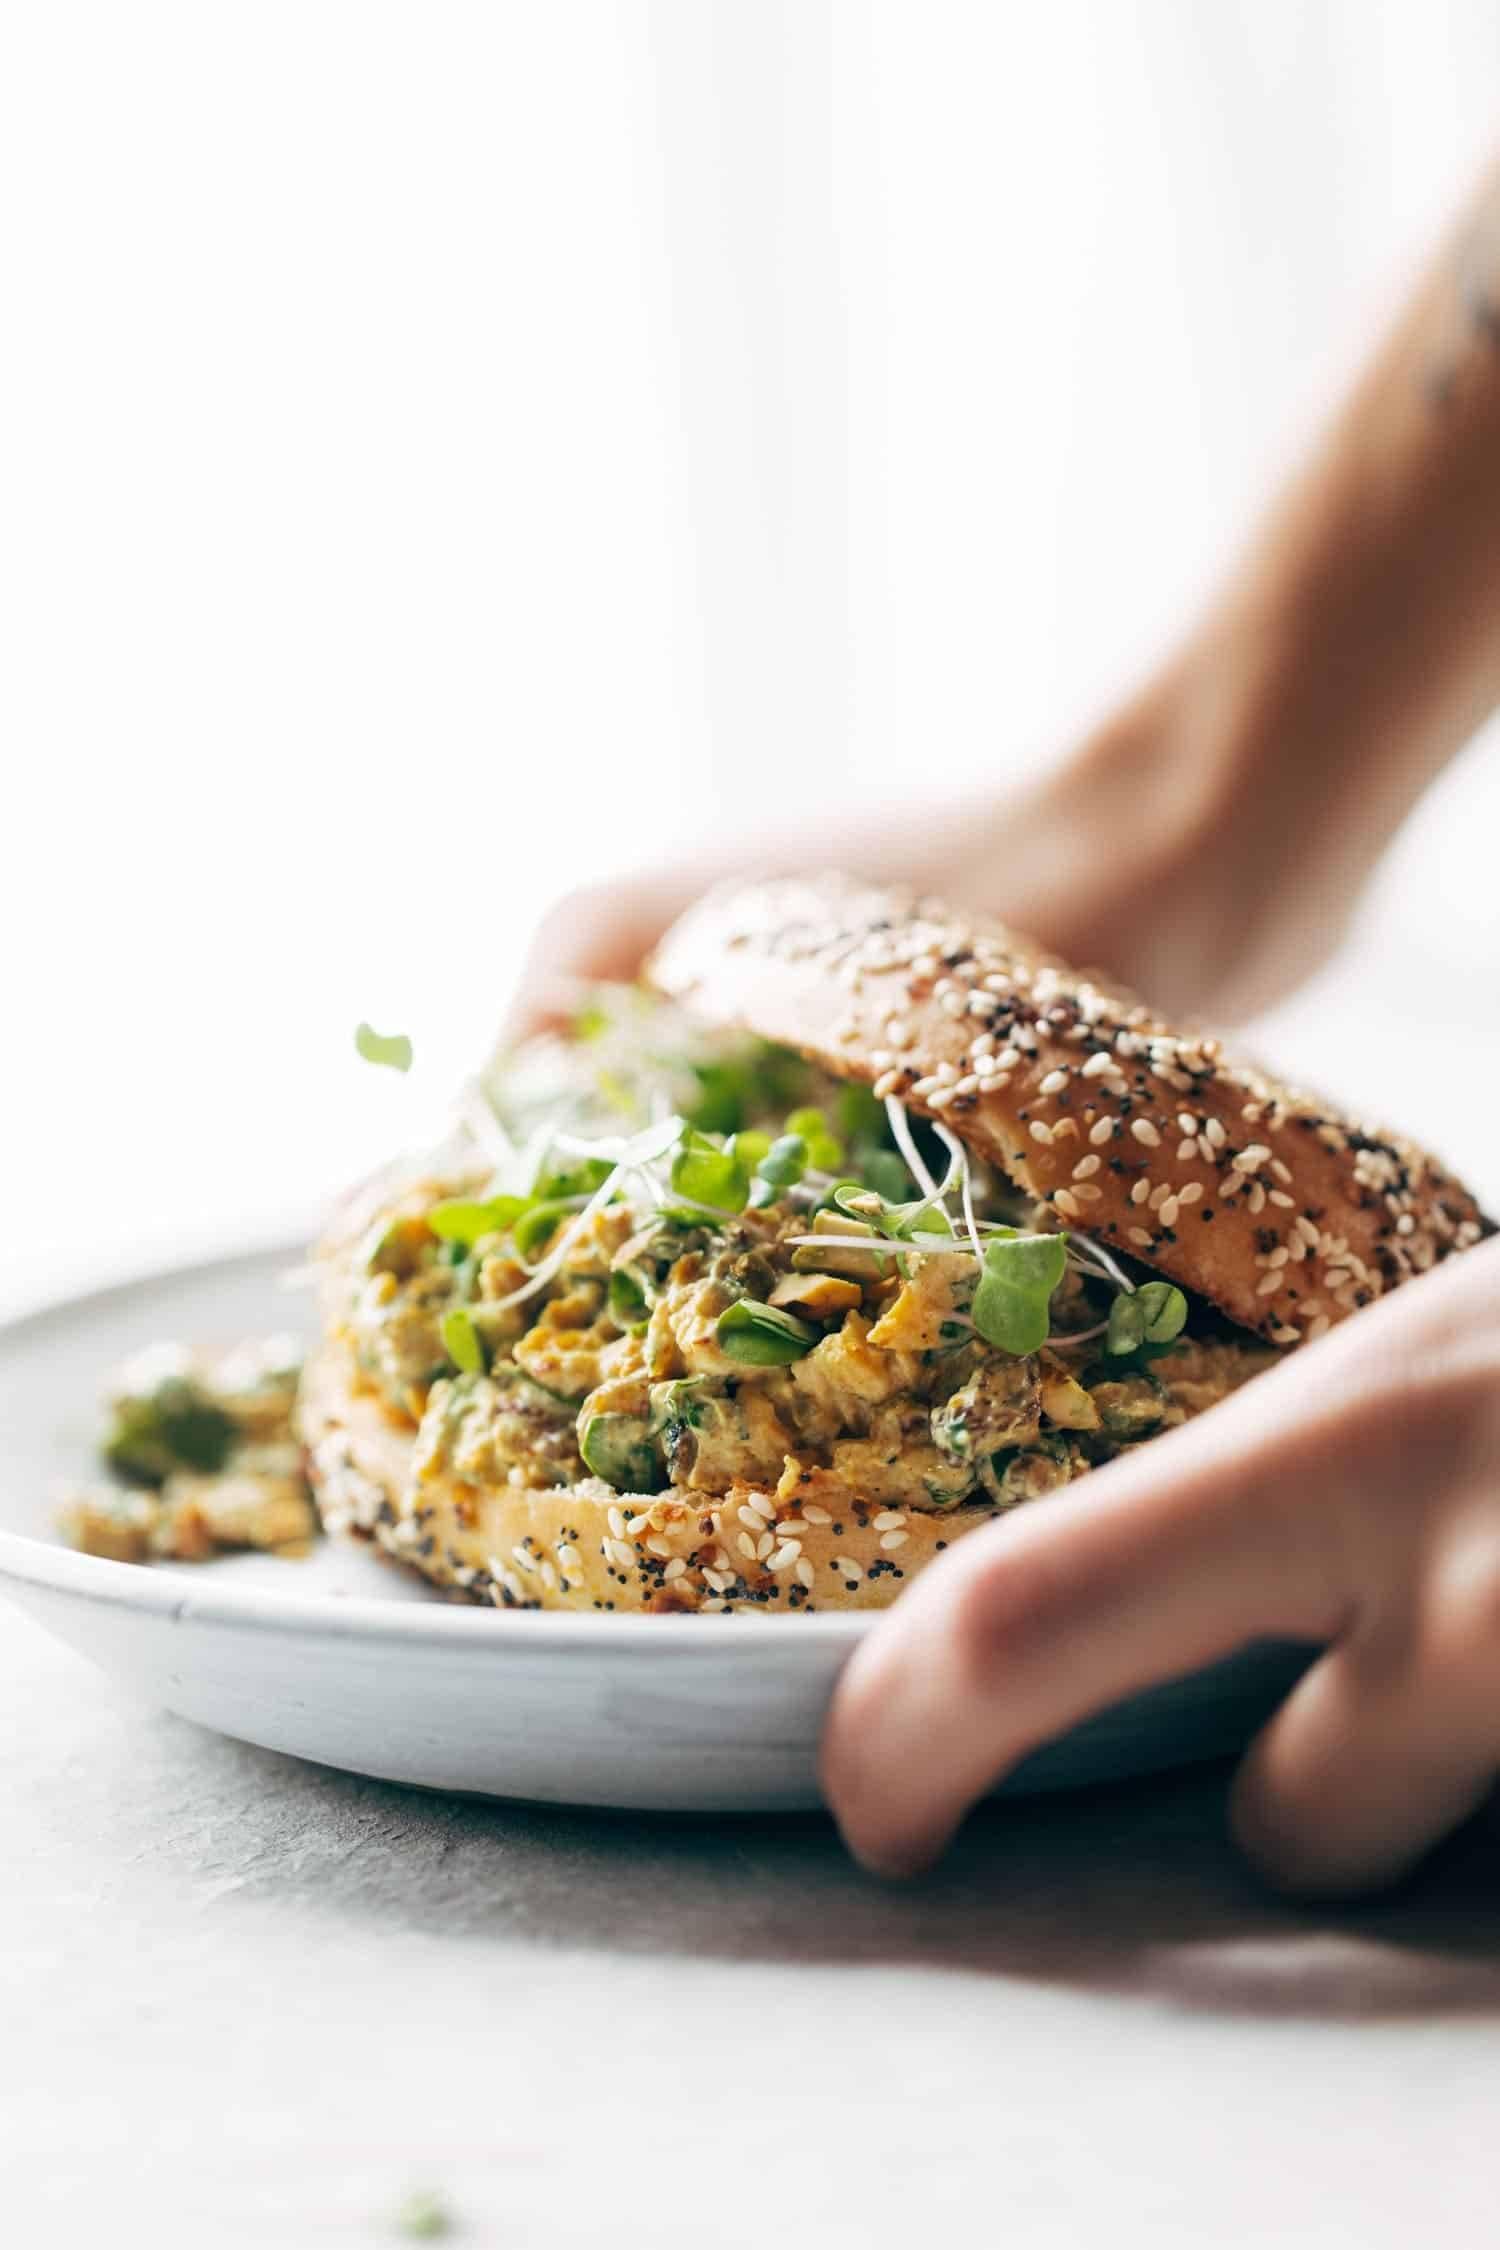 Curry Chicken Salad: healthy and super-yum. Just a few clean ingredients, like curry powder, chicken, golden raisins, pistachios, honey, and Greek yogurt. | pinchofyum.com